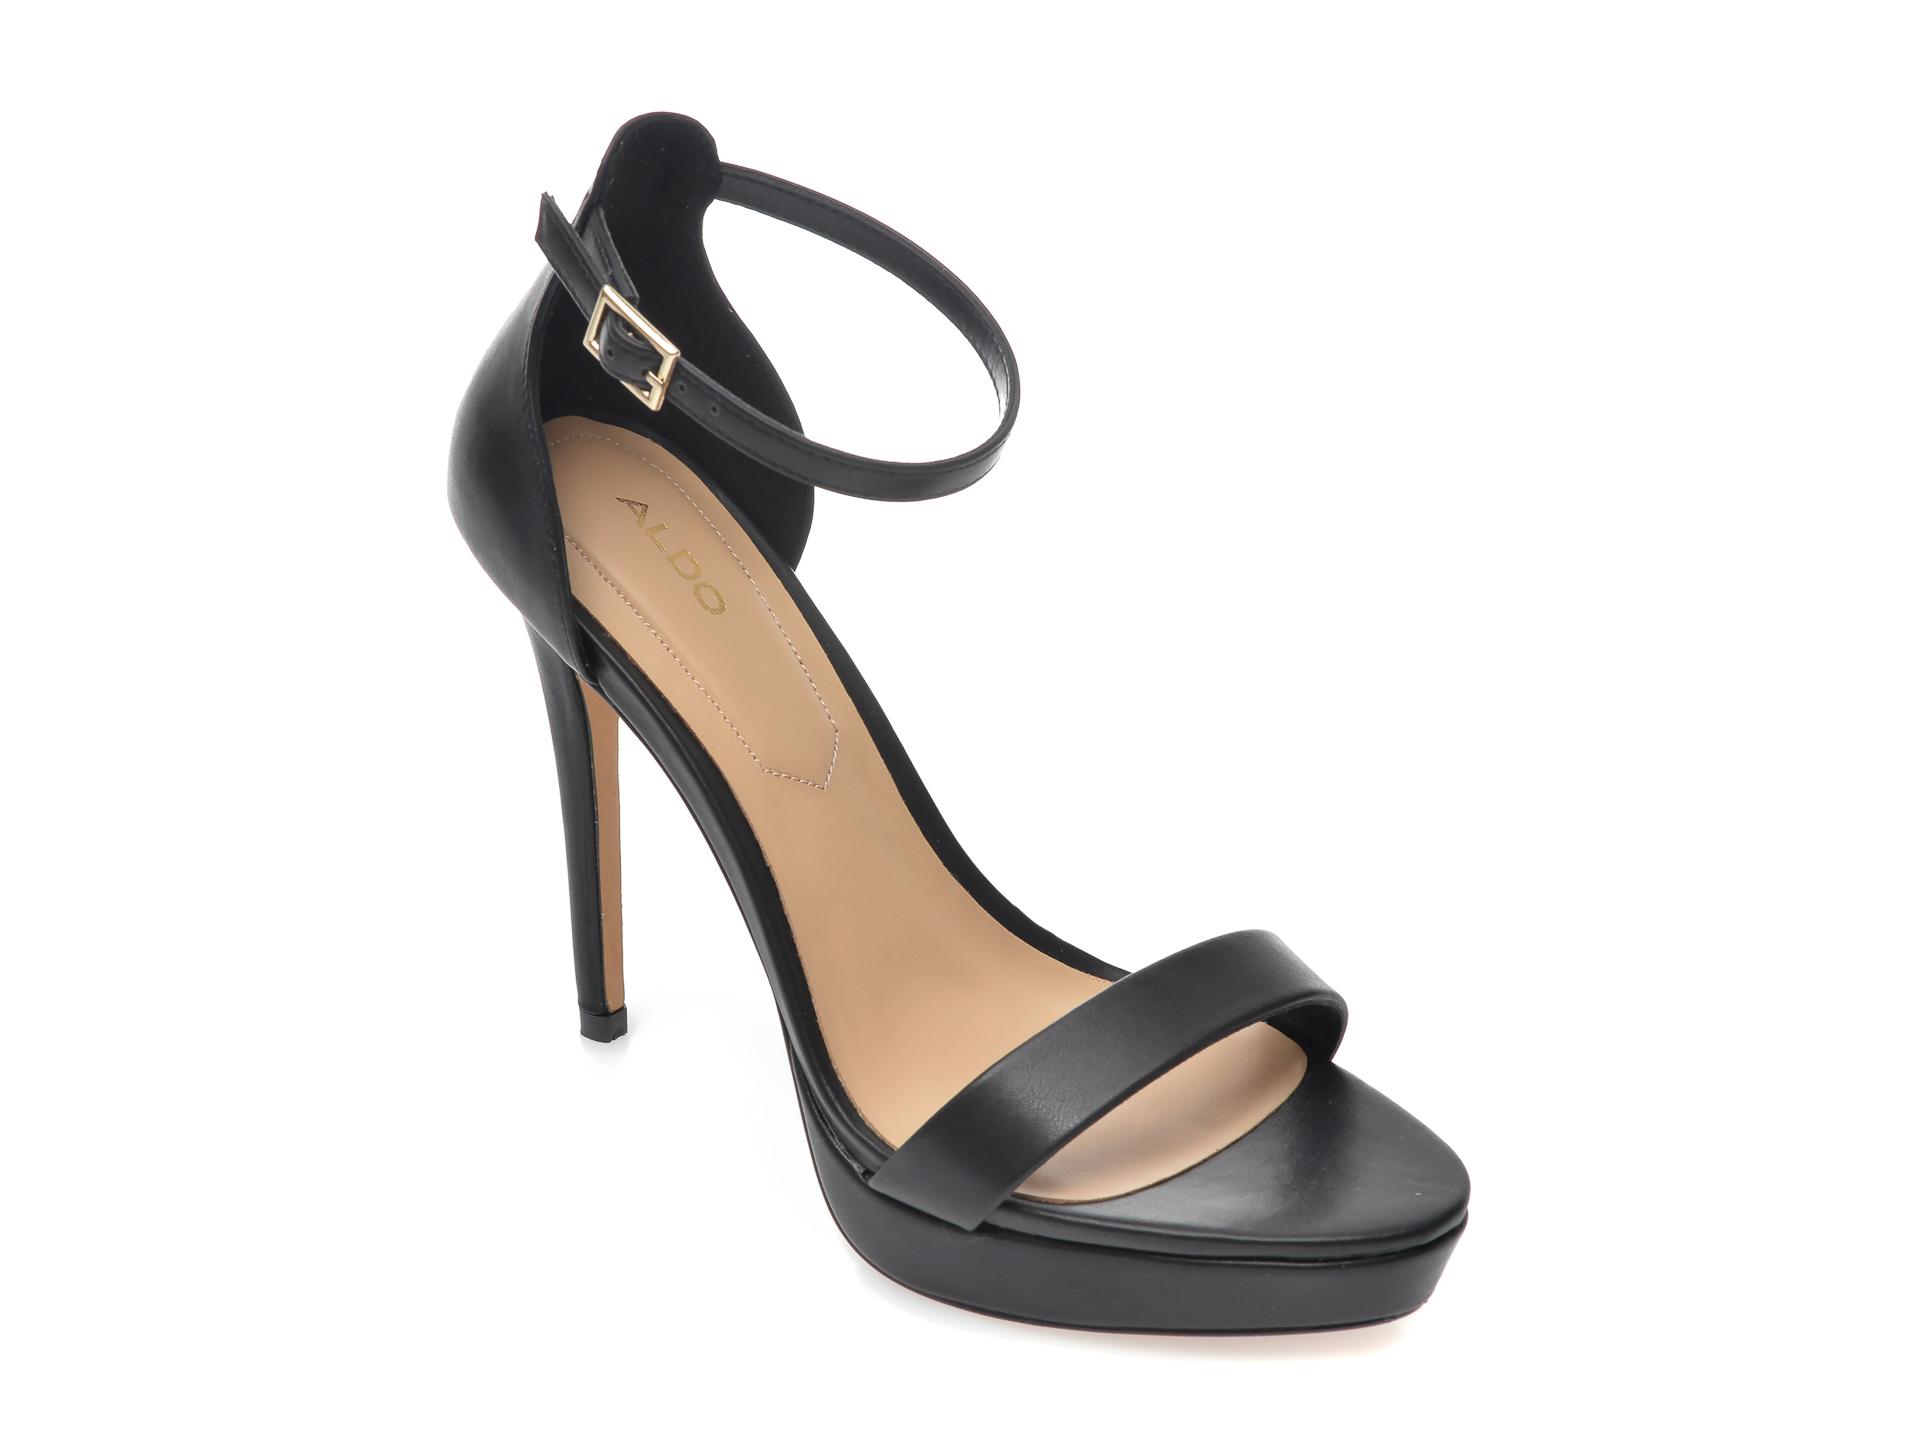 Sandale ALDO negre, Madalene001, din piele ecologica New